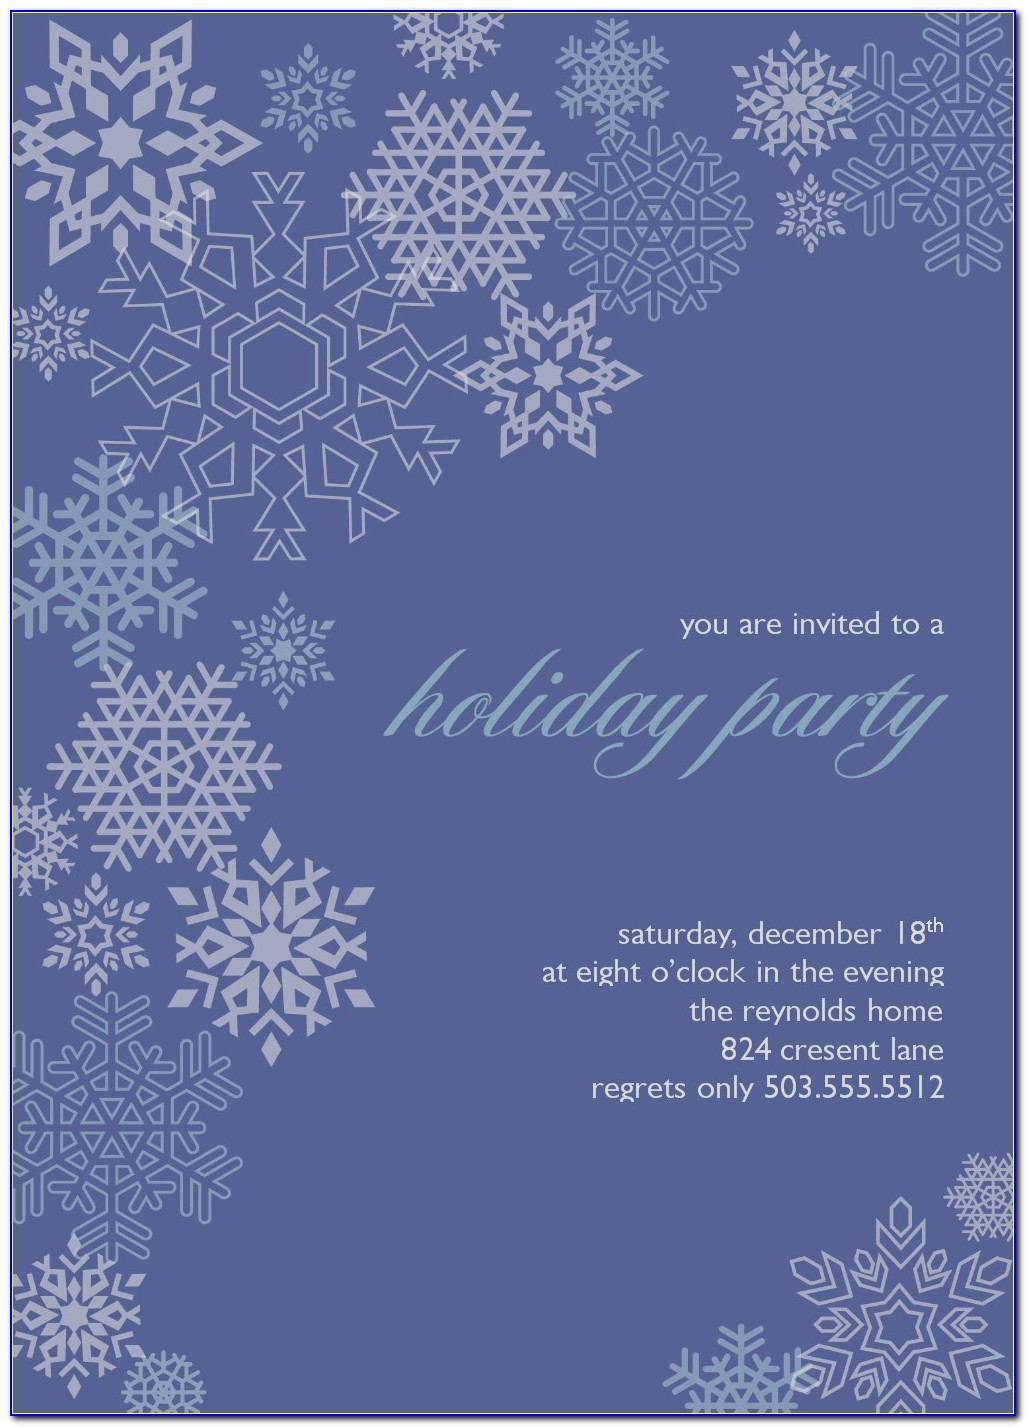 Snowflake Invitation Card Template